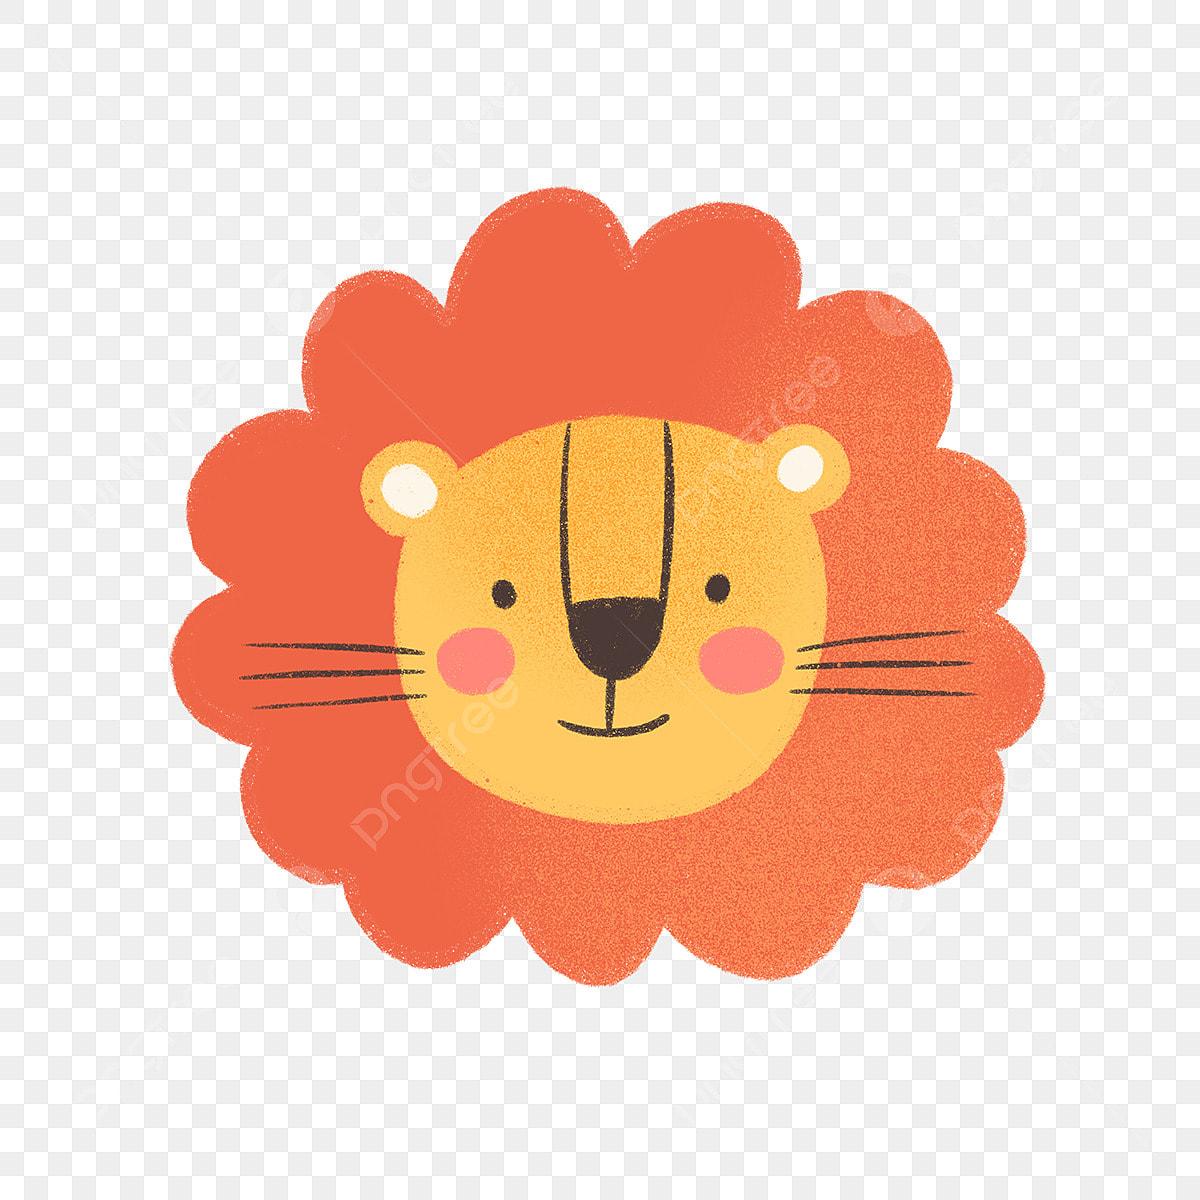 Tangan Ditarik El Wajah Singa Haiwan Binatang Kartun